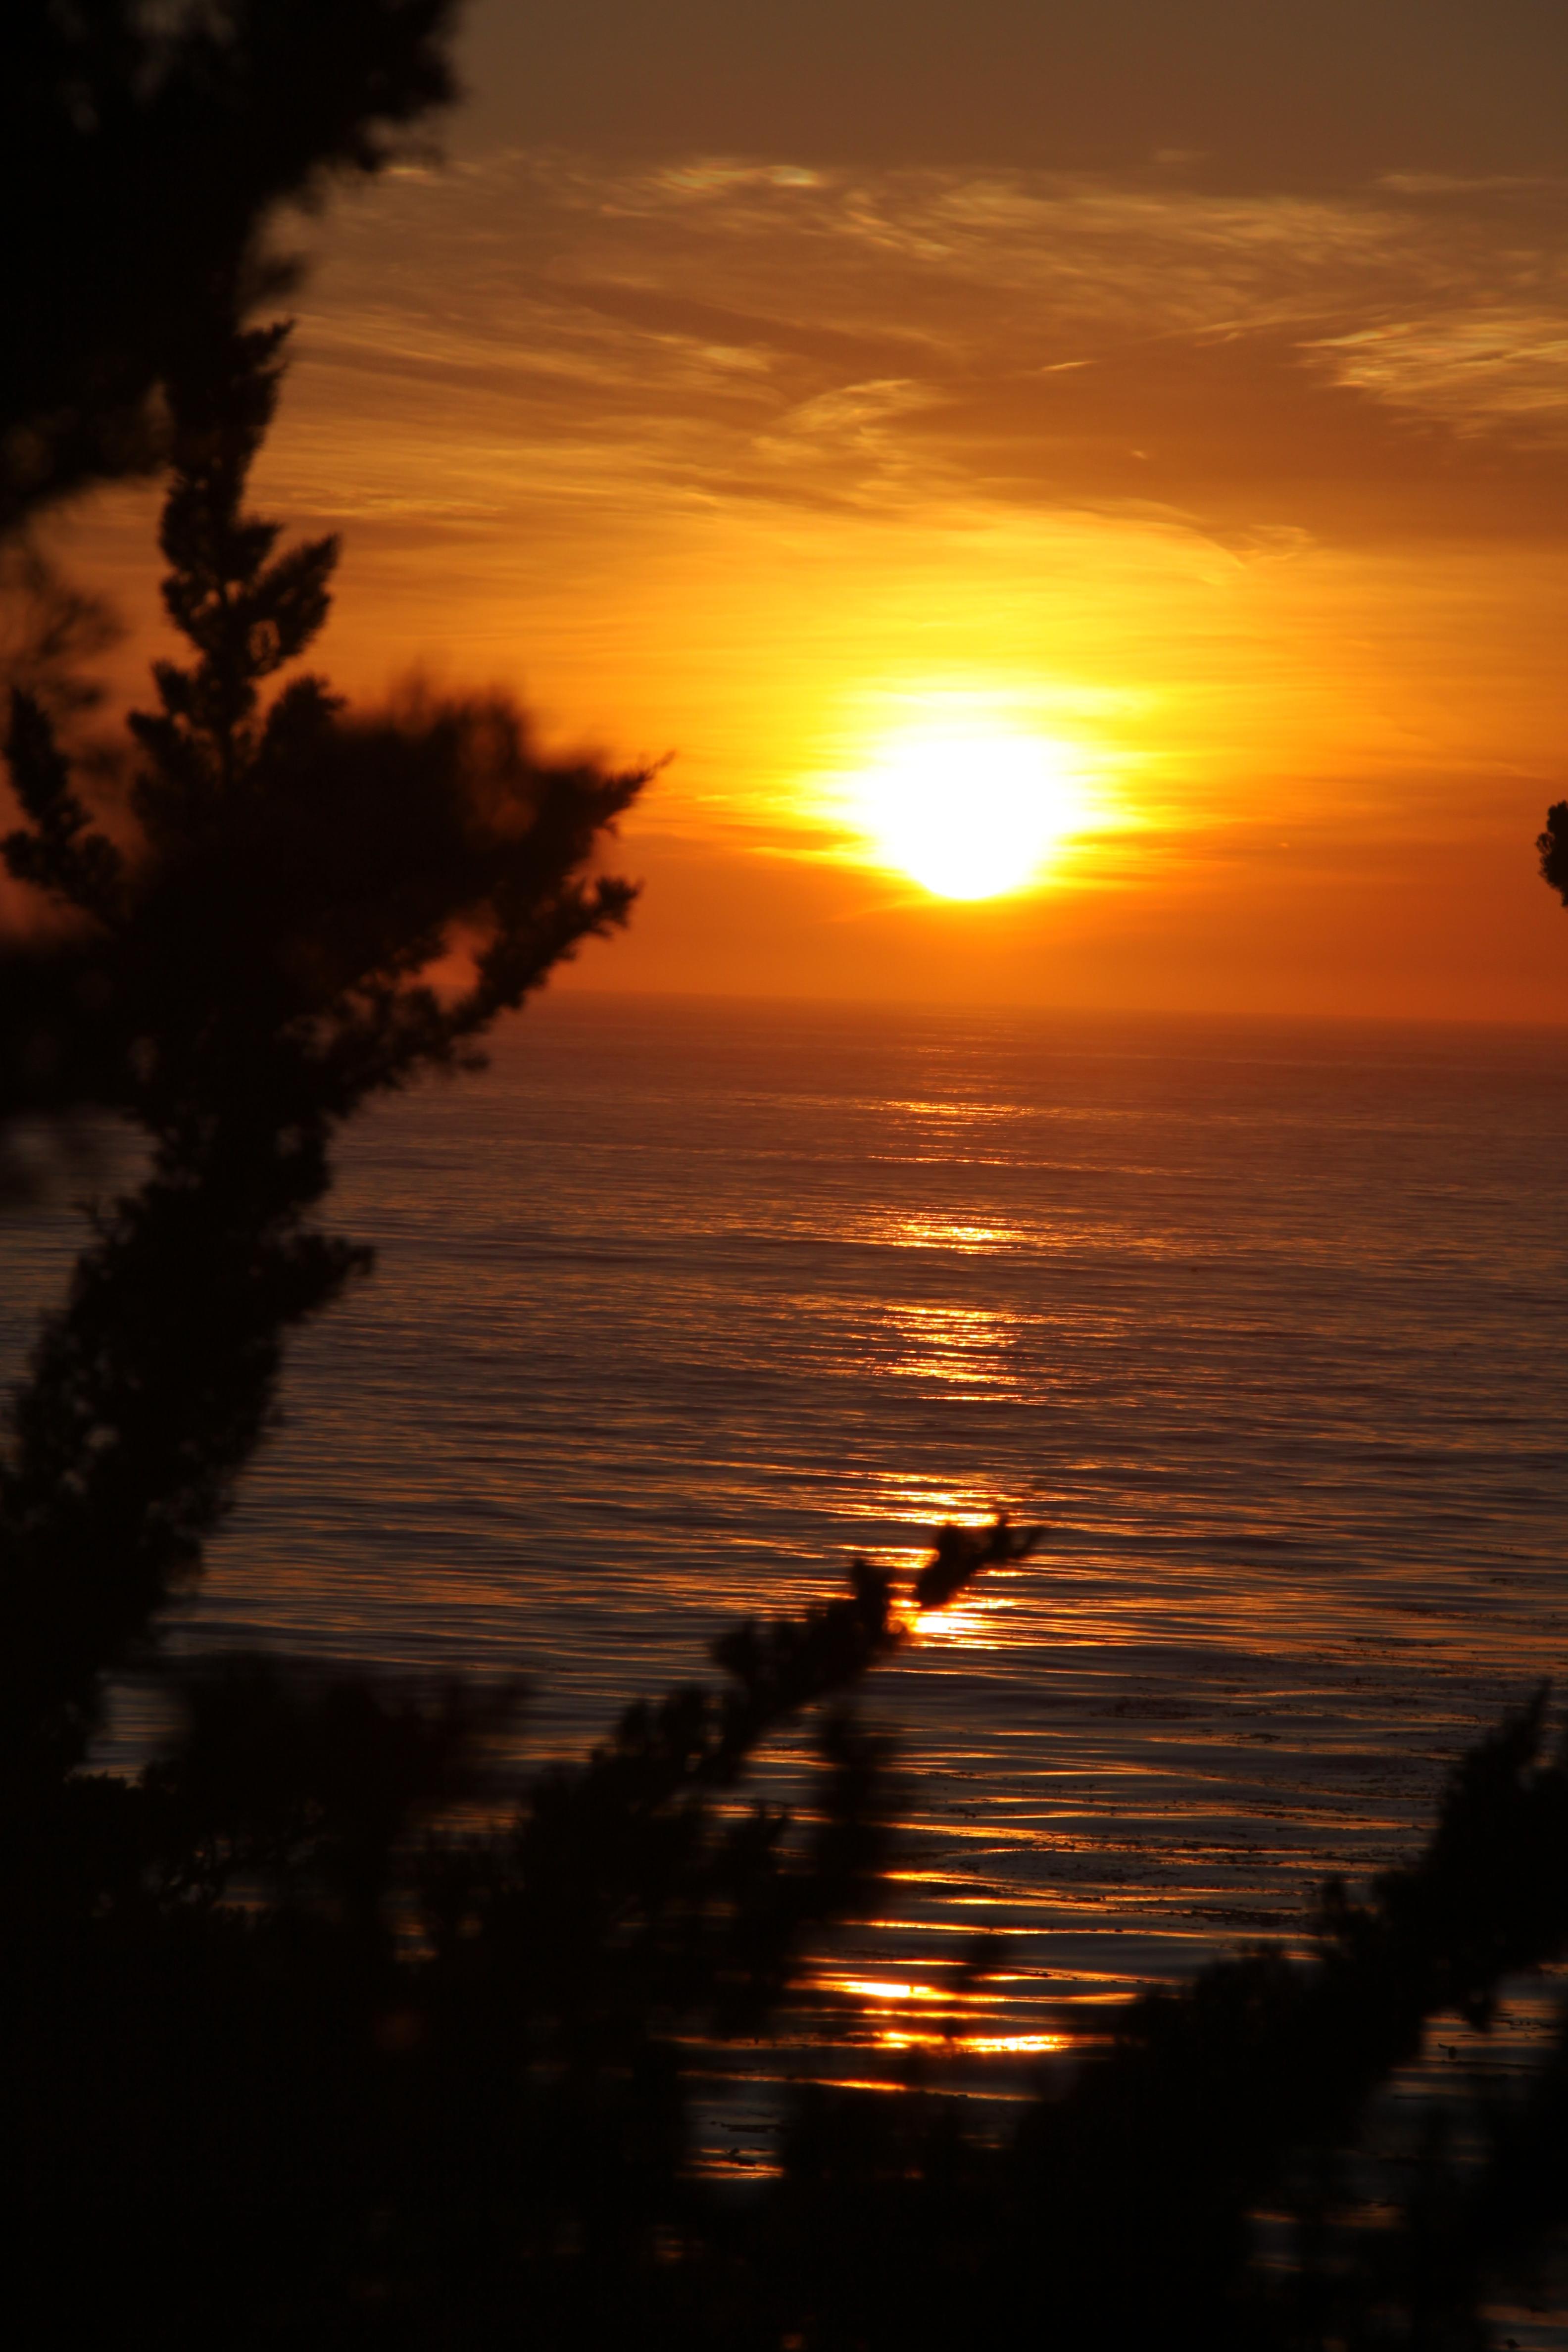 Big Sur Sunset Sunset in Big Sur